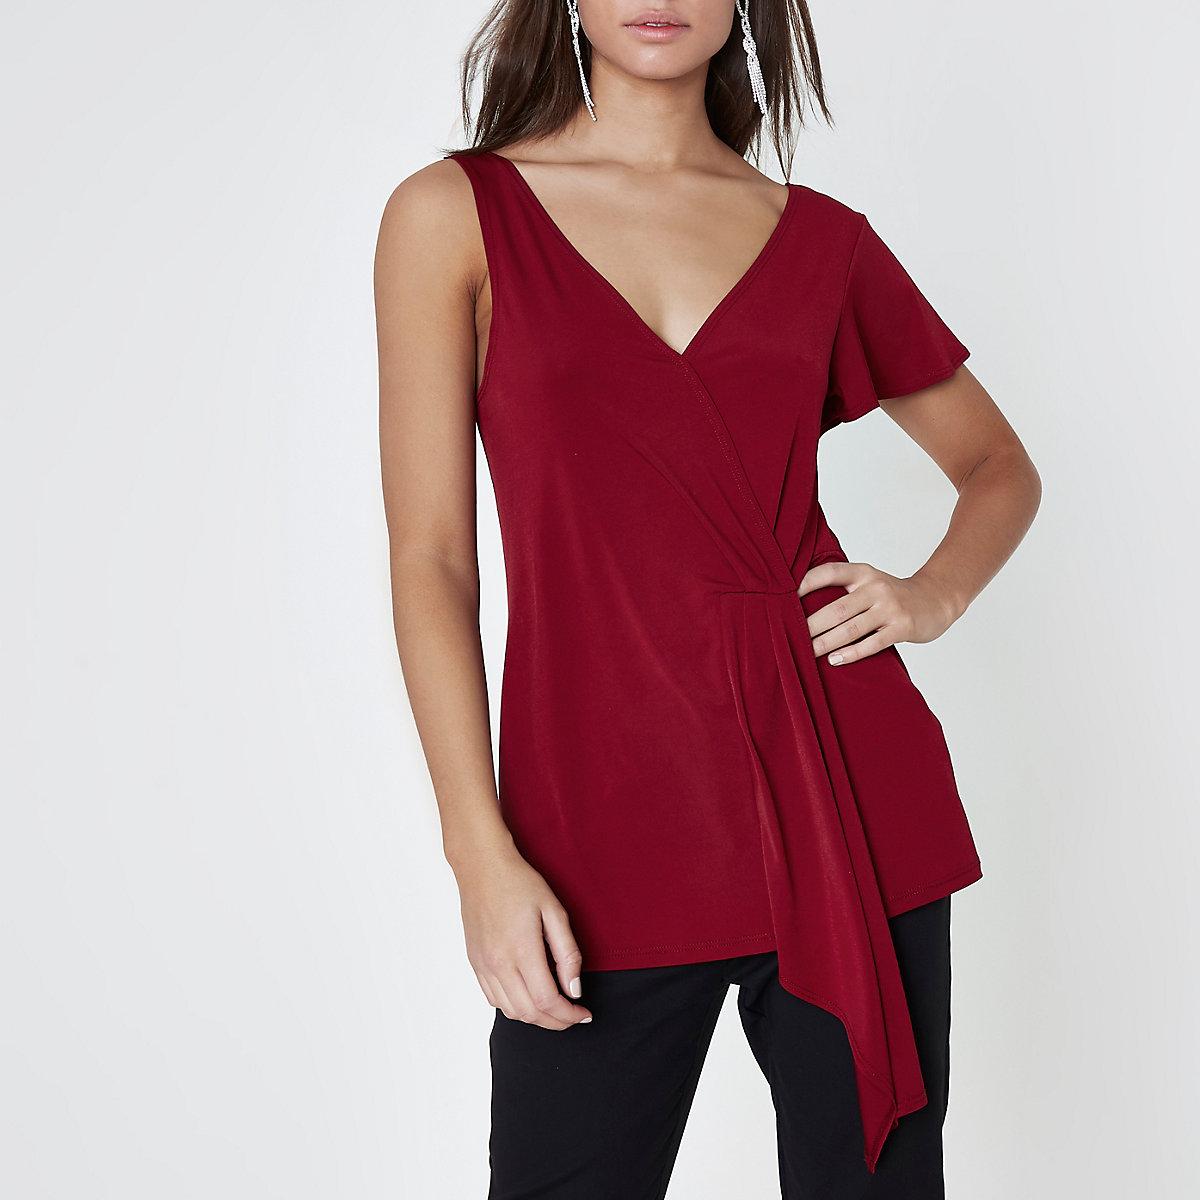 Dark red one shoulder ruched top